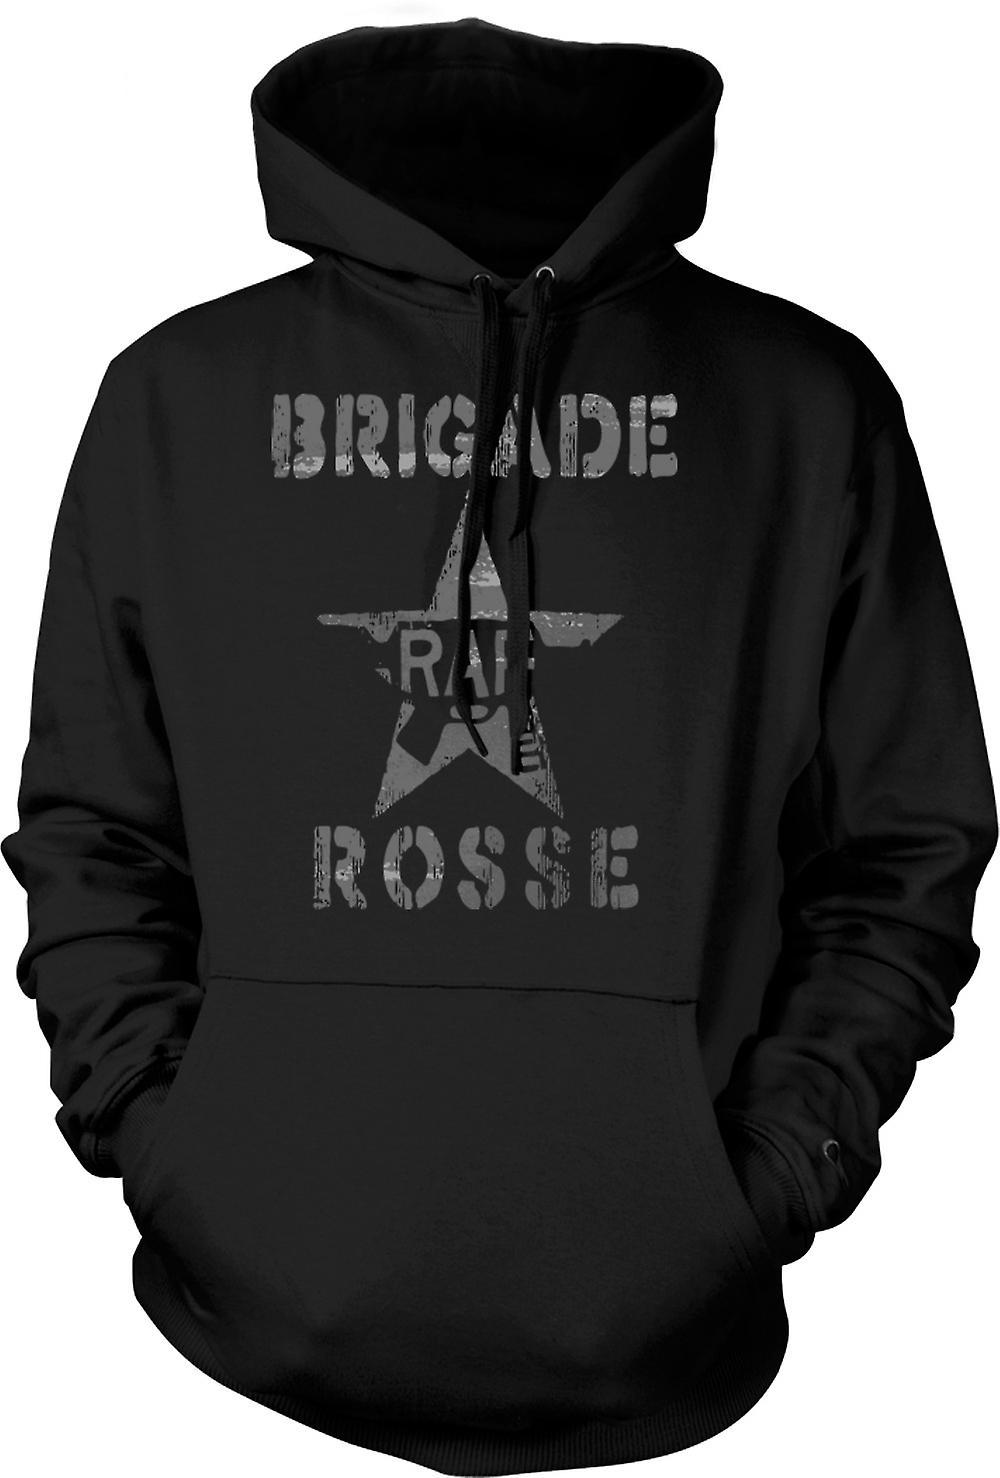 Mens Hoodie - brigata Rosse - marxista